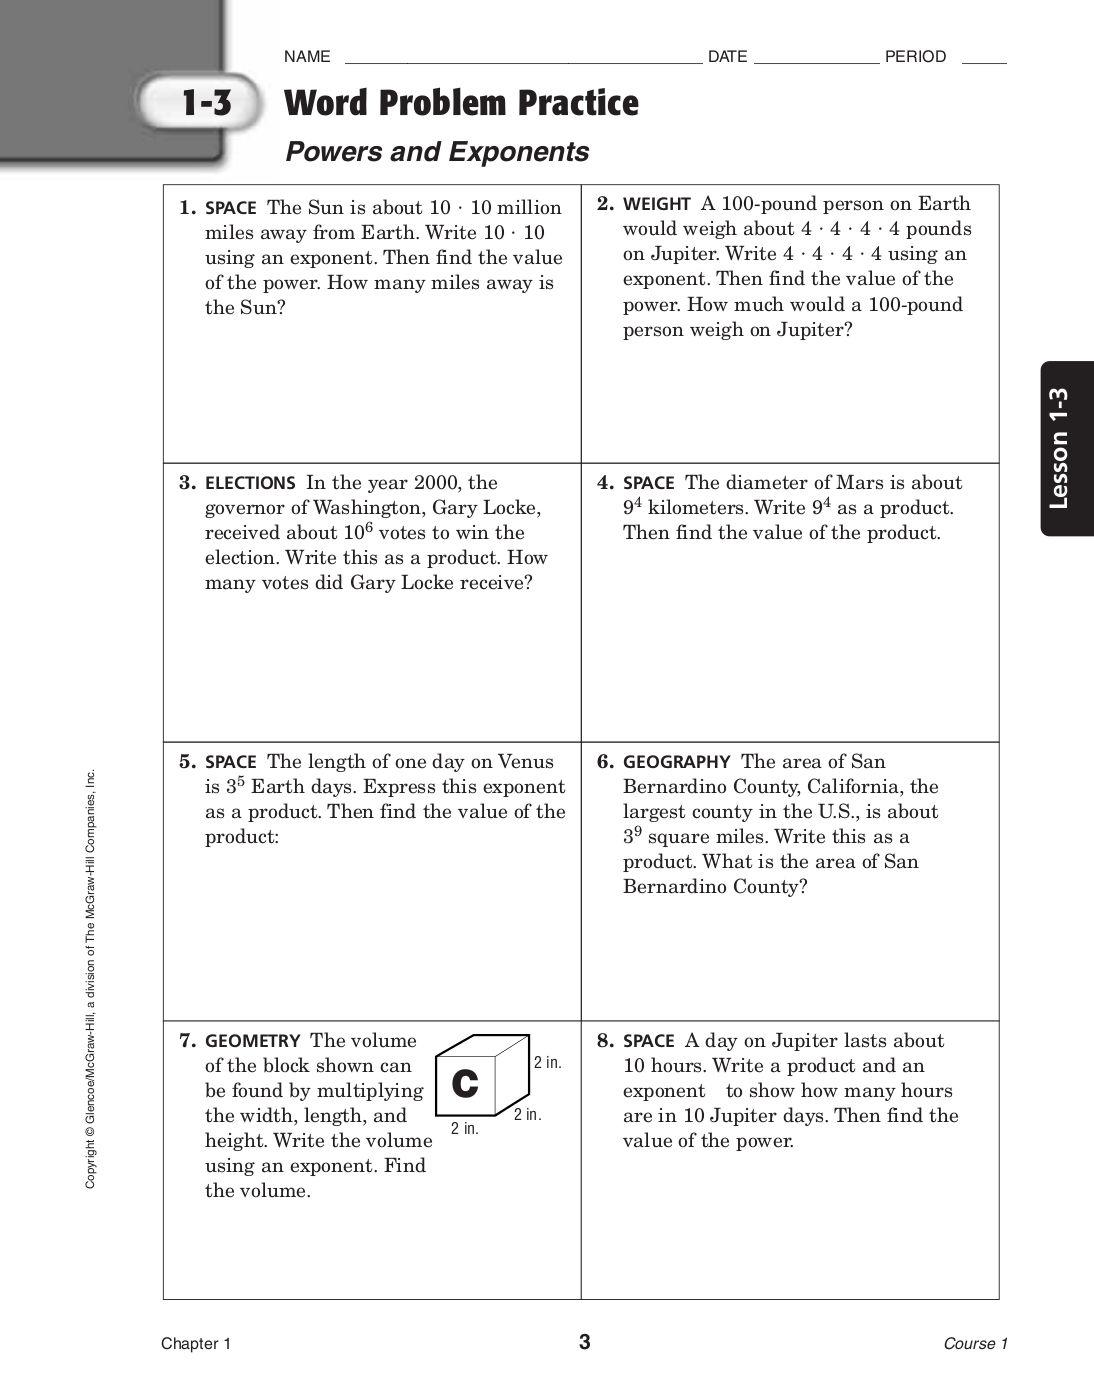 W Ksheet Re W D Problems W Ksheets Mytourvn W Ksheet Study